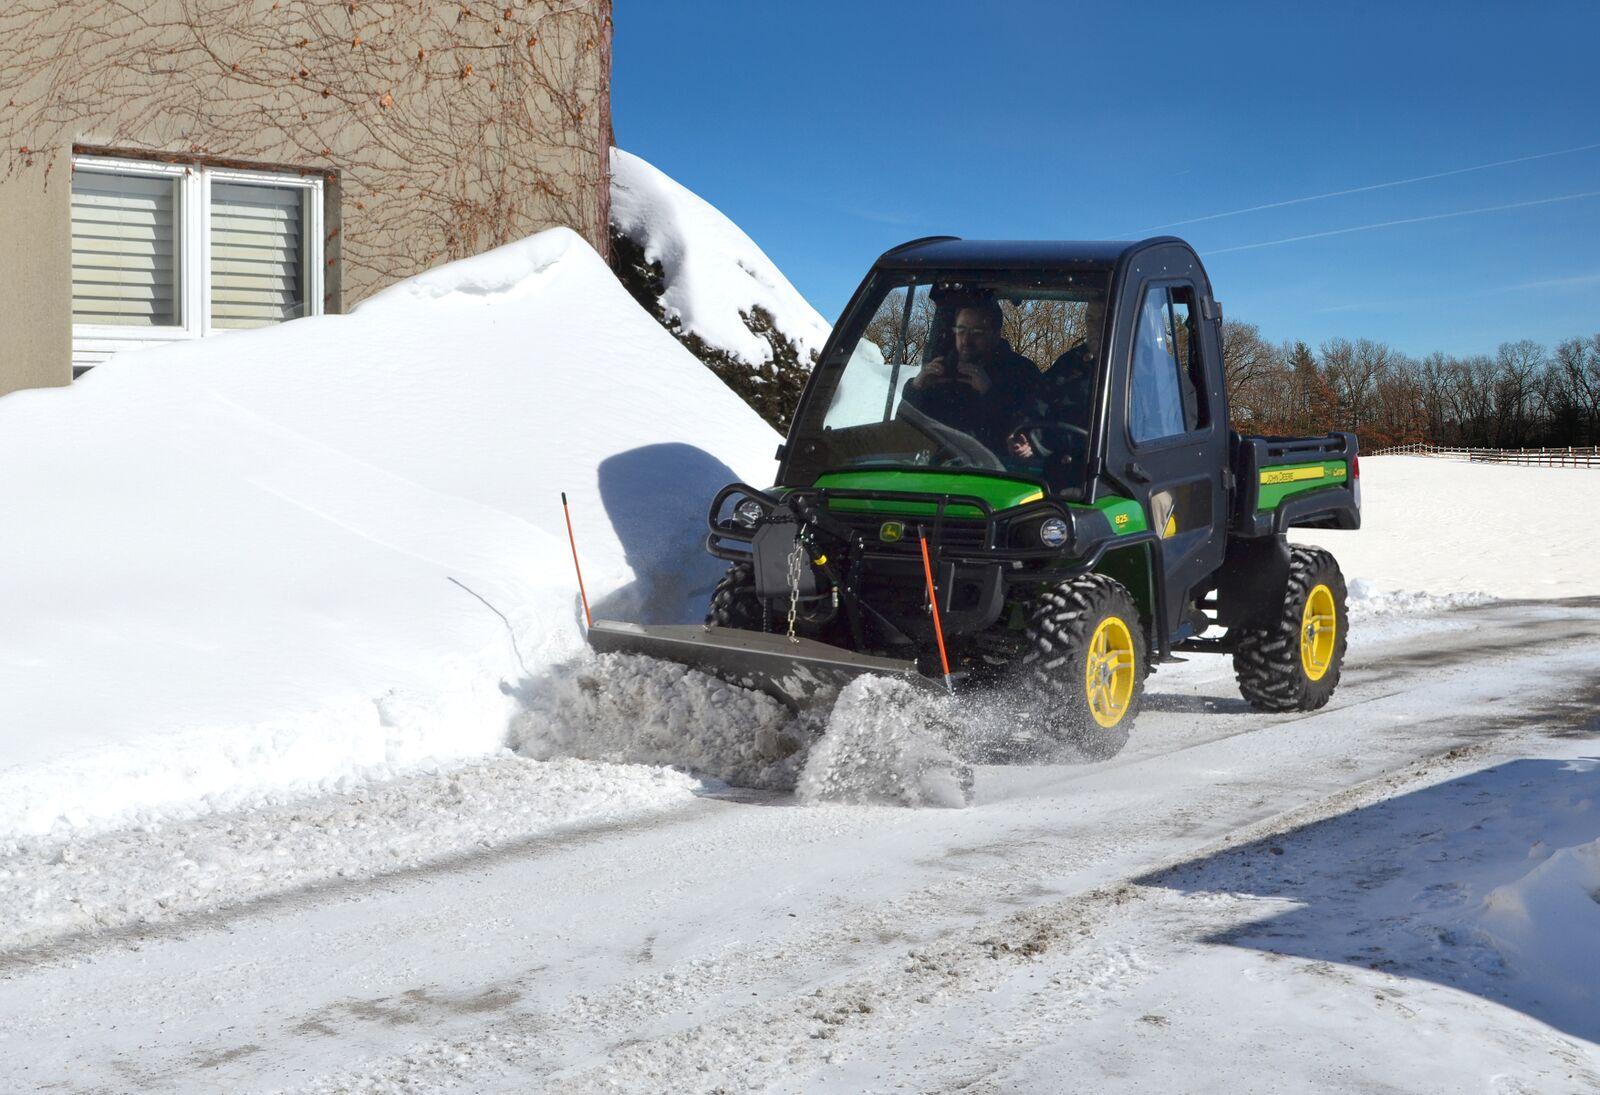 John Deere Gator Plow >> Curtis 72 Inch Snow Plow Blade For John Deere Xuv Gators